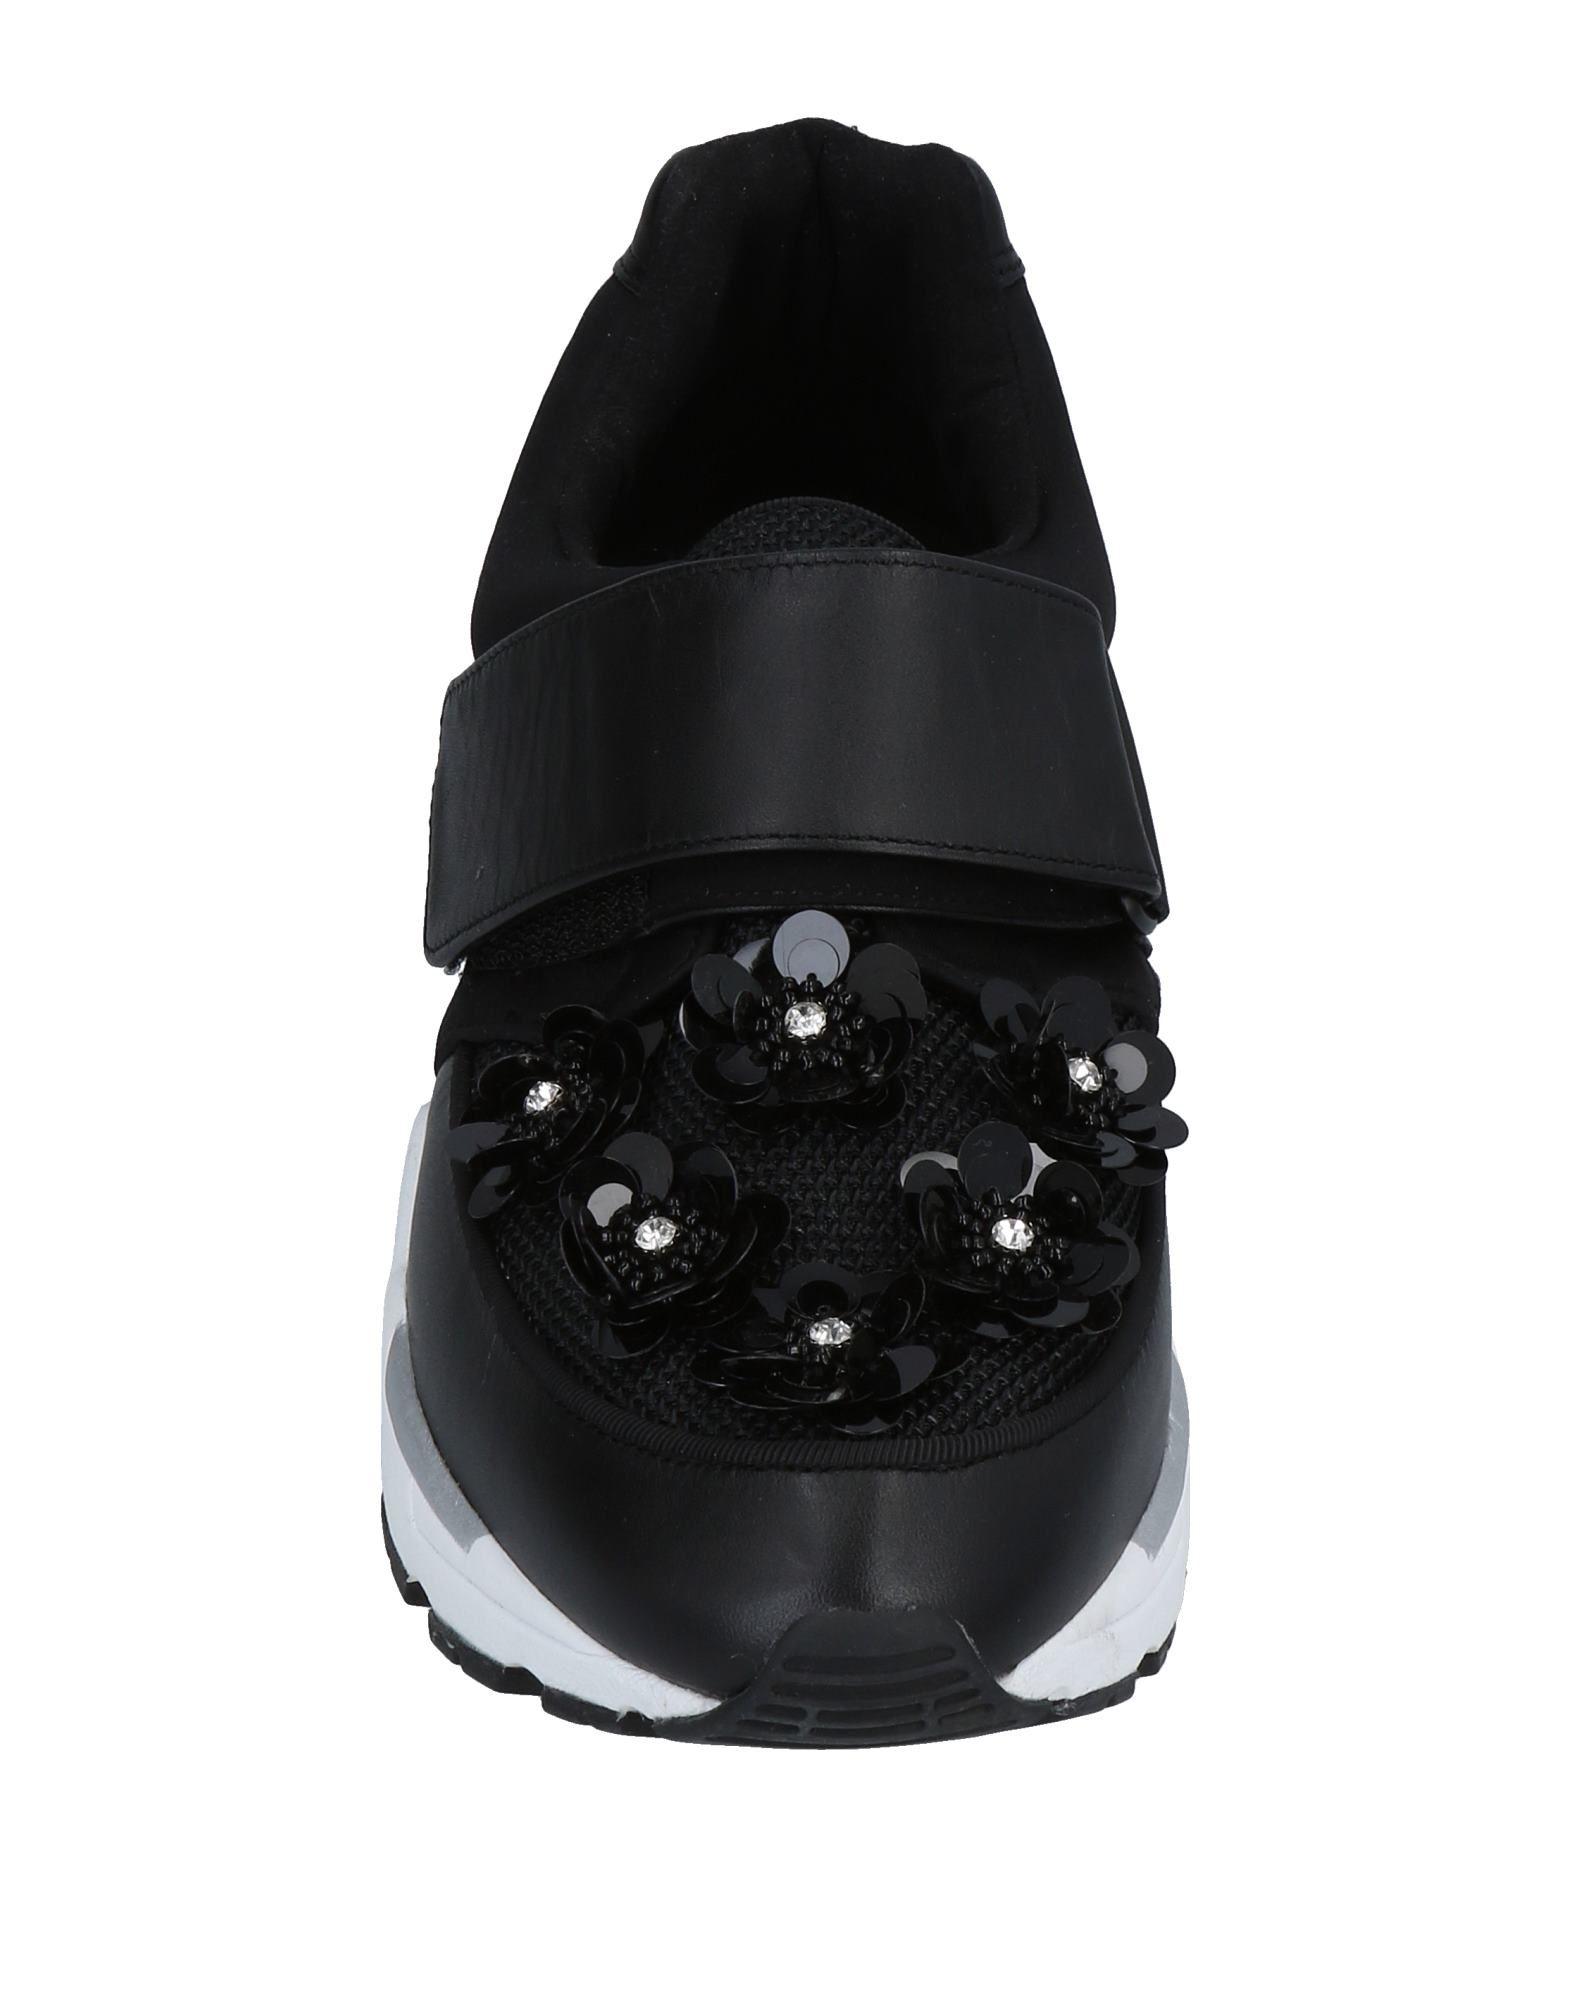 Stilvolle billige Schuhe Suecomma 11481873WE Bonnie Sneakers Damen  11481873WE Suecomma ec6506